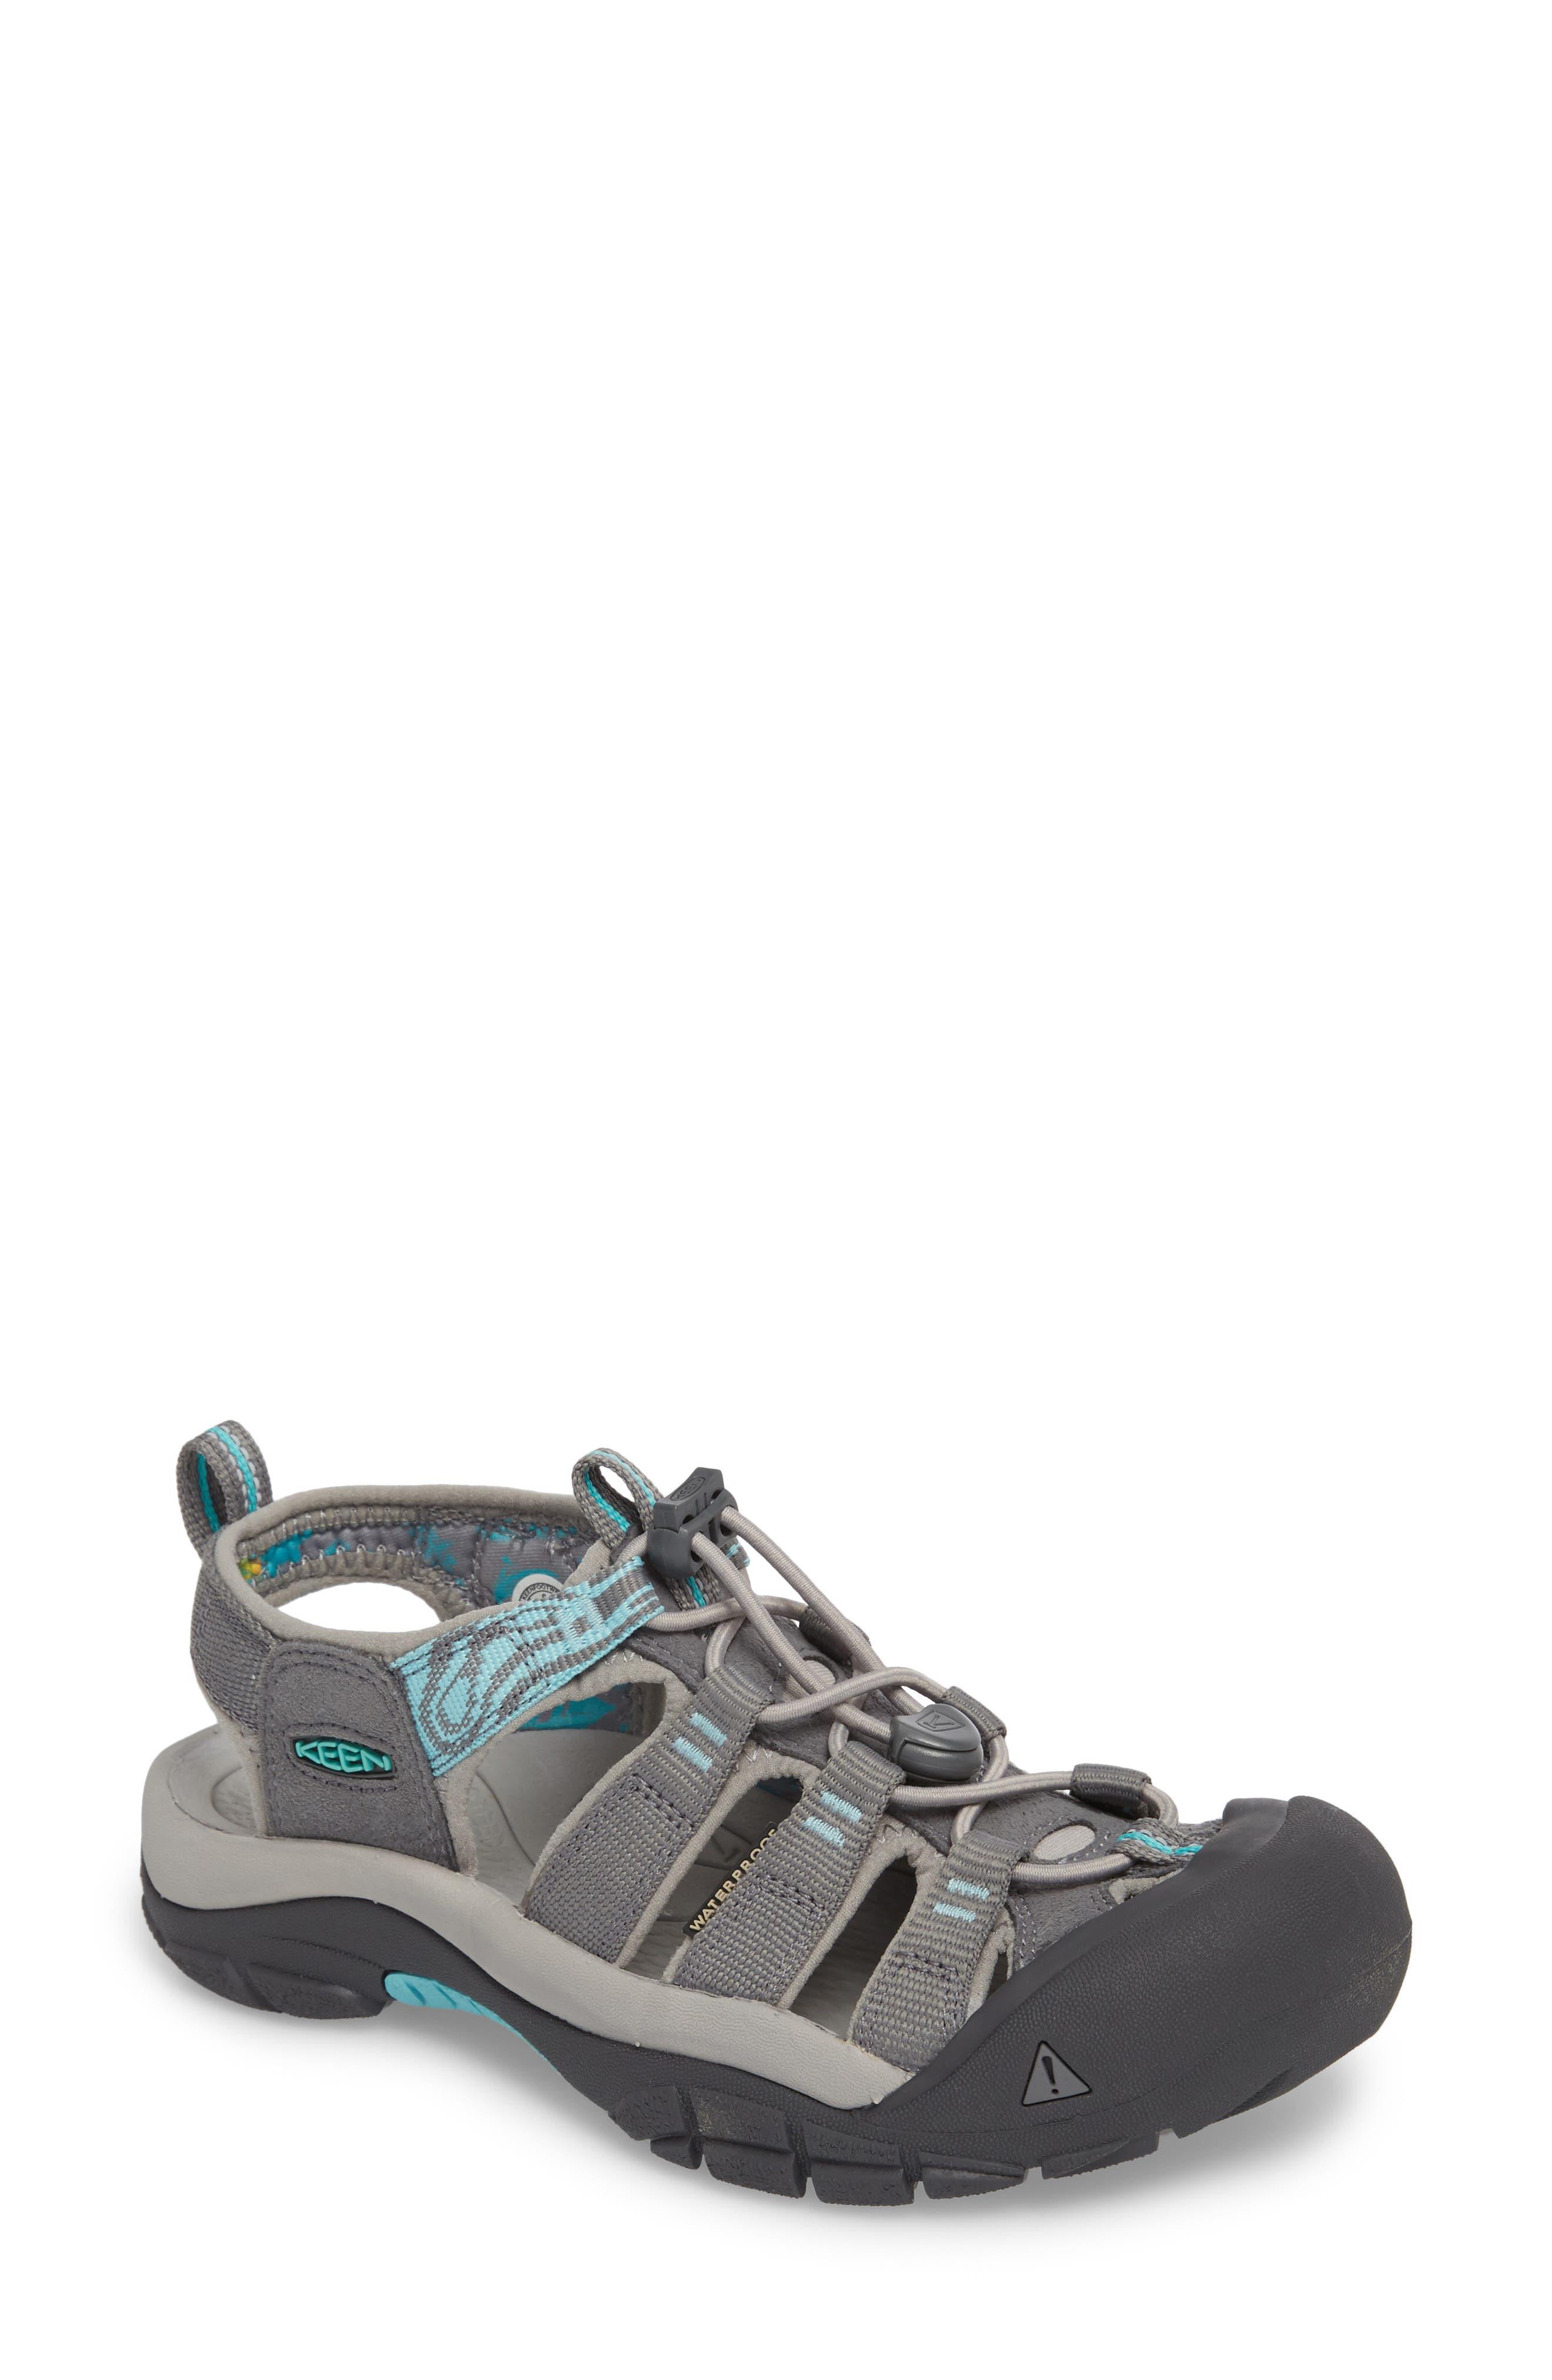 Keen Newport Hydro Sandal, Grey